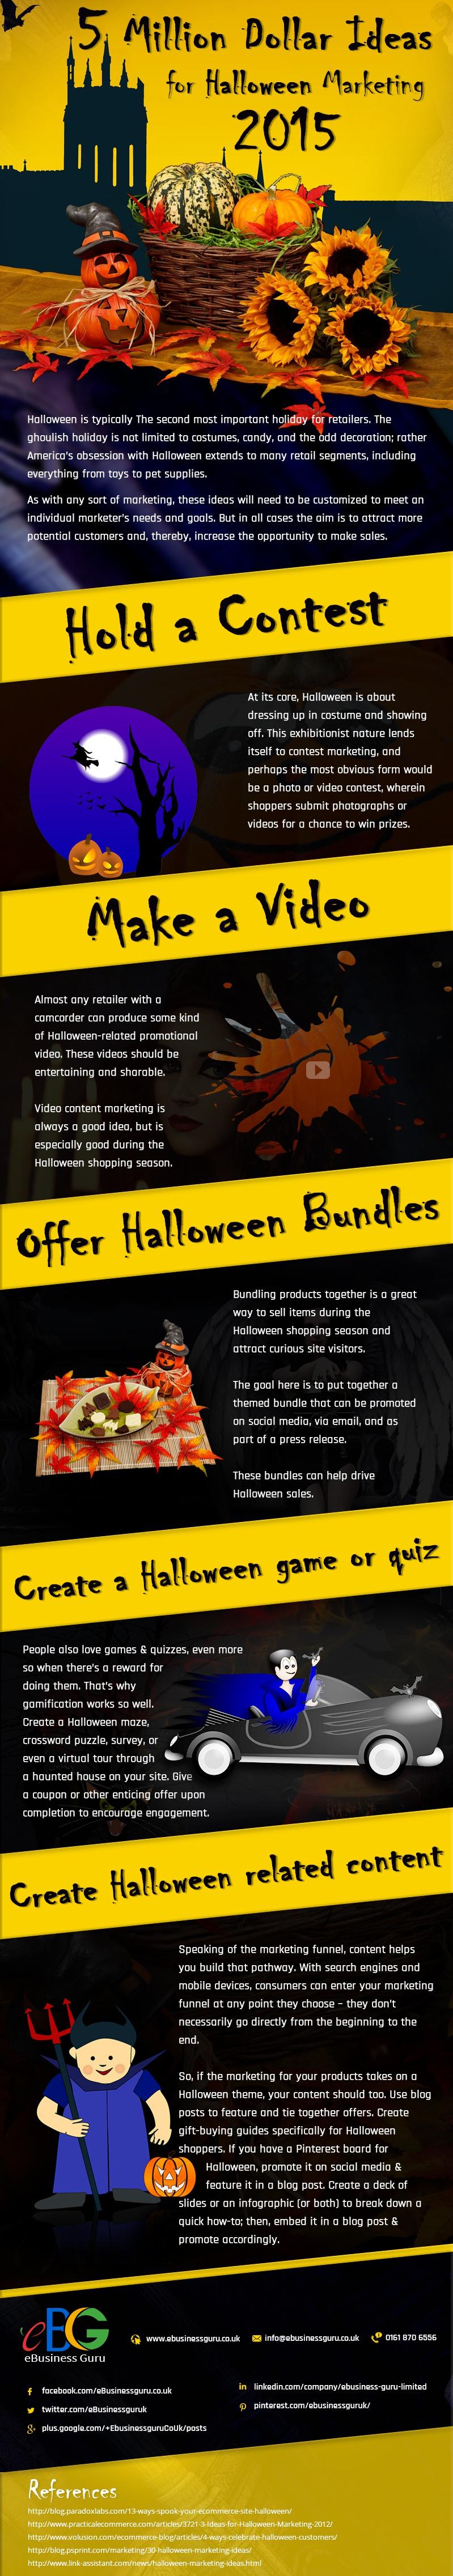 5 Million Dollar Ideas For Halloween Marketing 2015 - Infographic